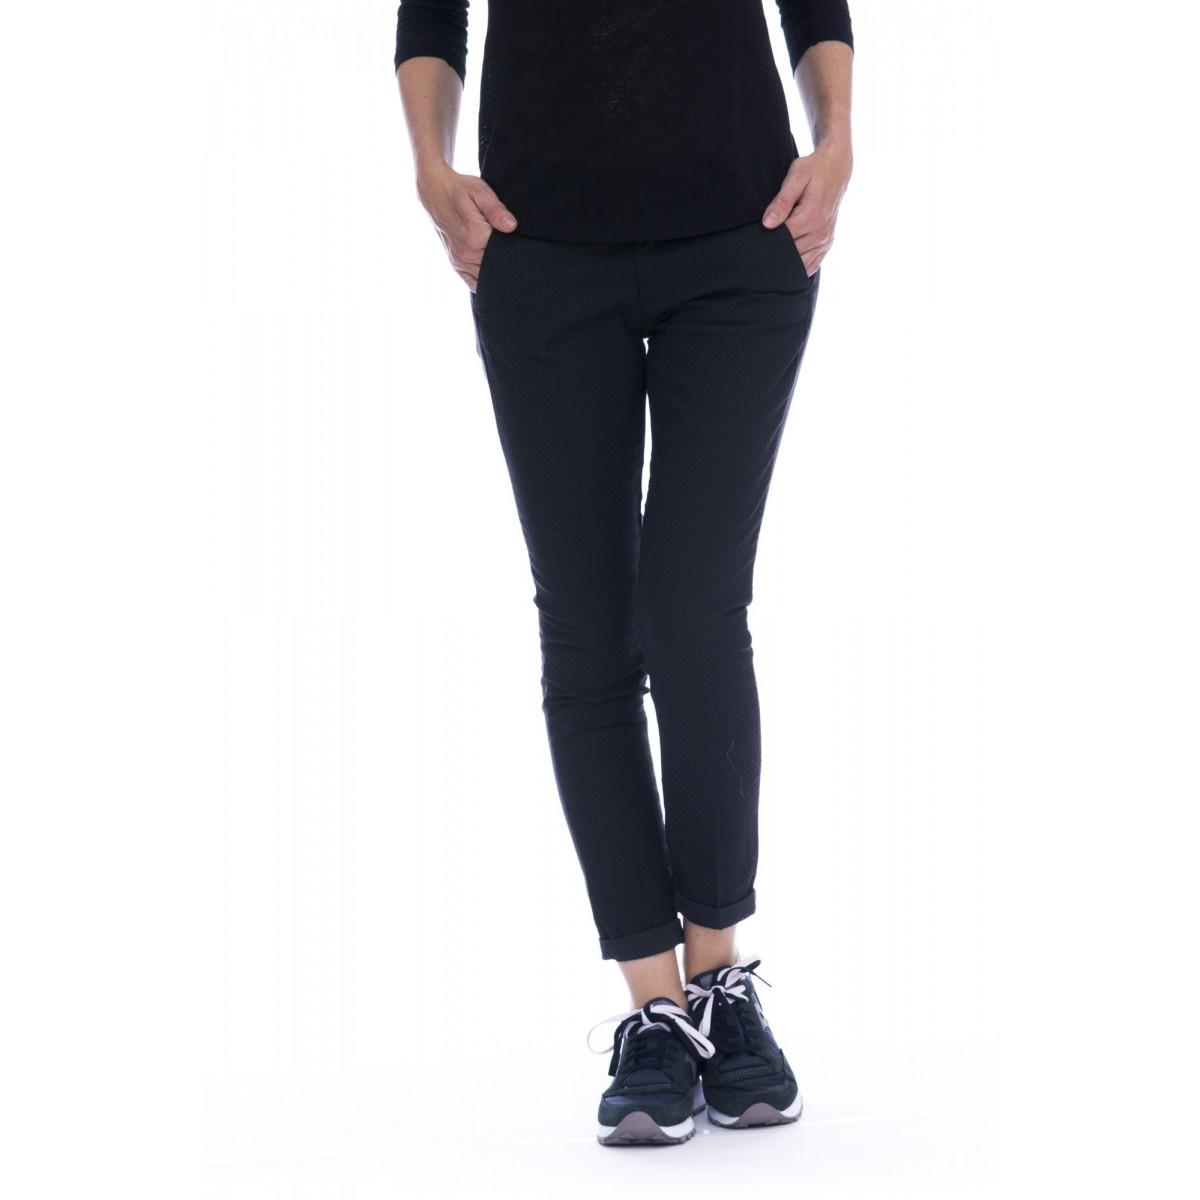 Pantalone donna 40 weft - Melia 8693 microperato